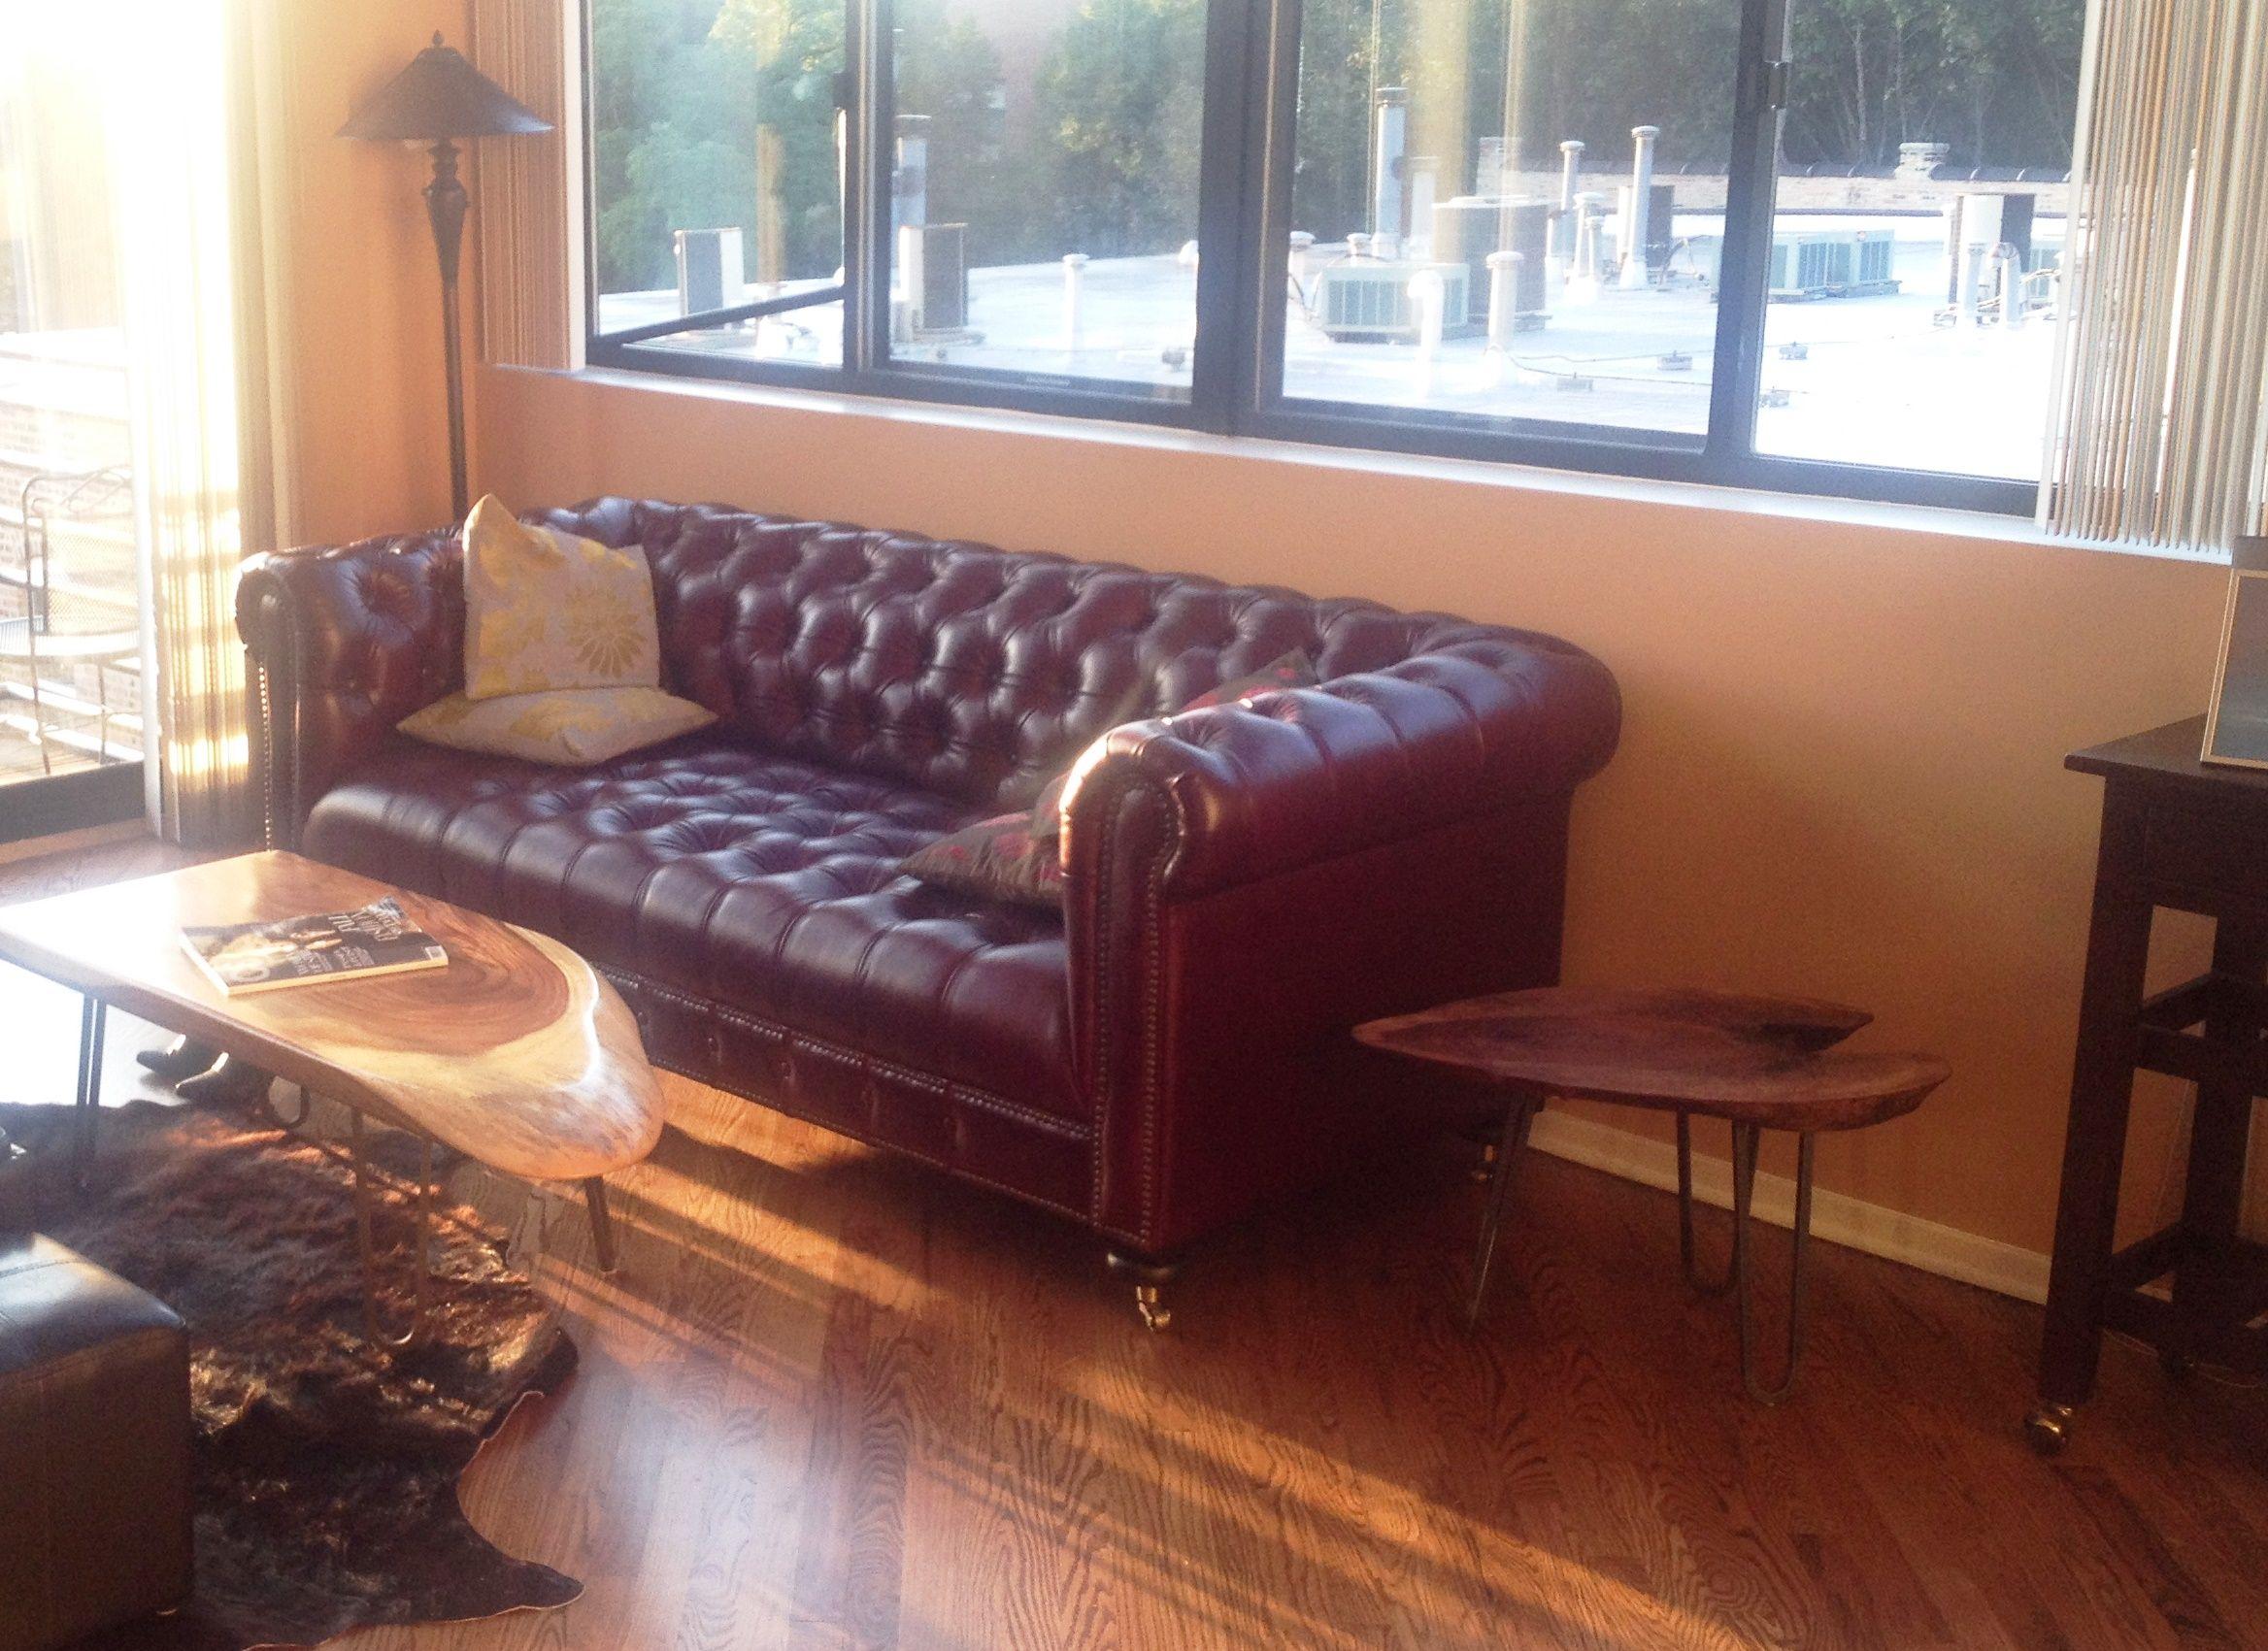 Joybird Theo Leather Sofa from Lena Matz